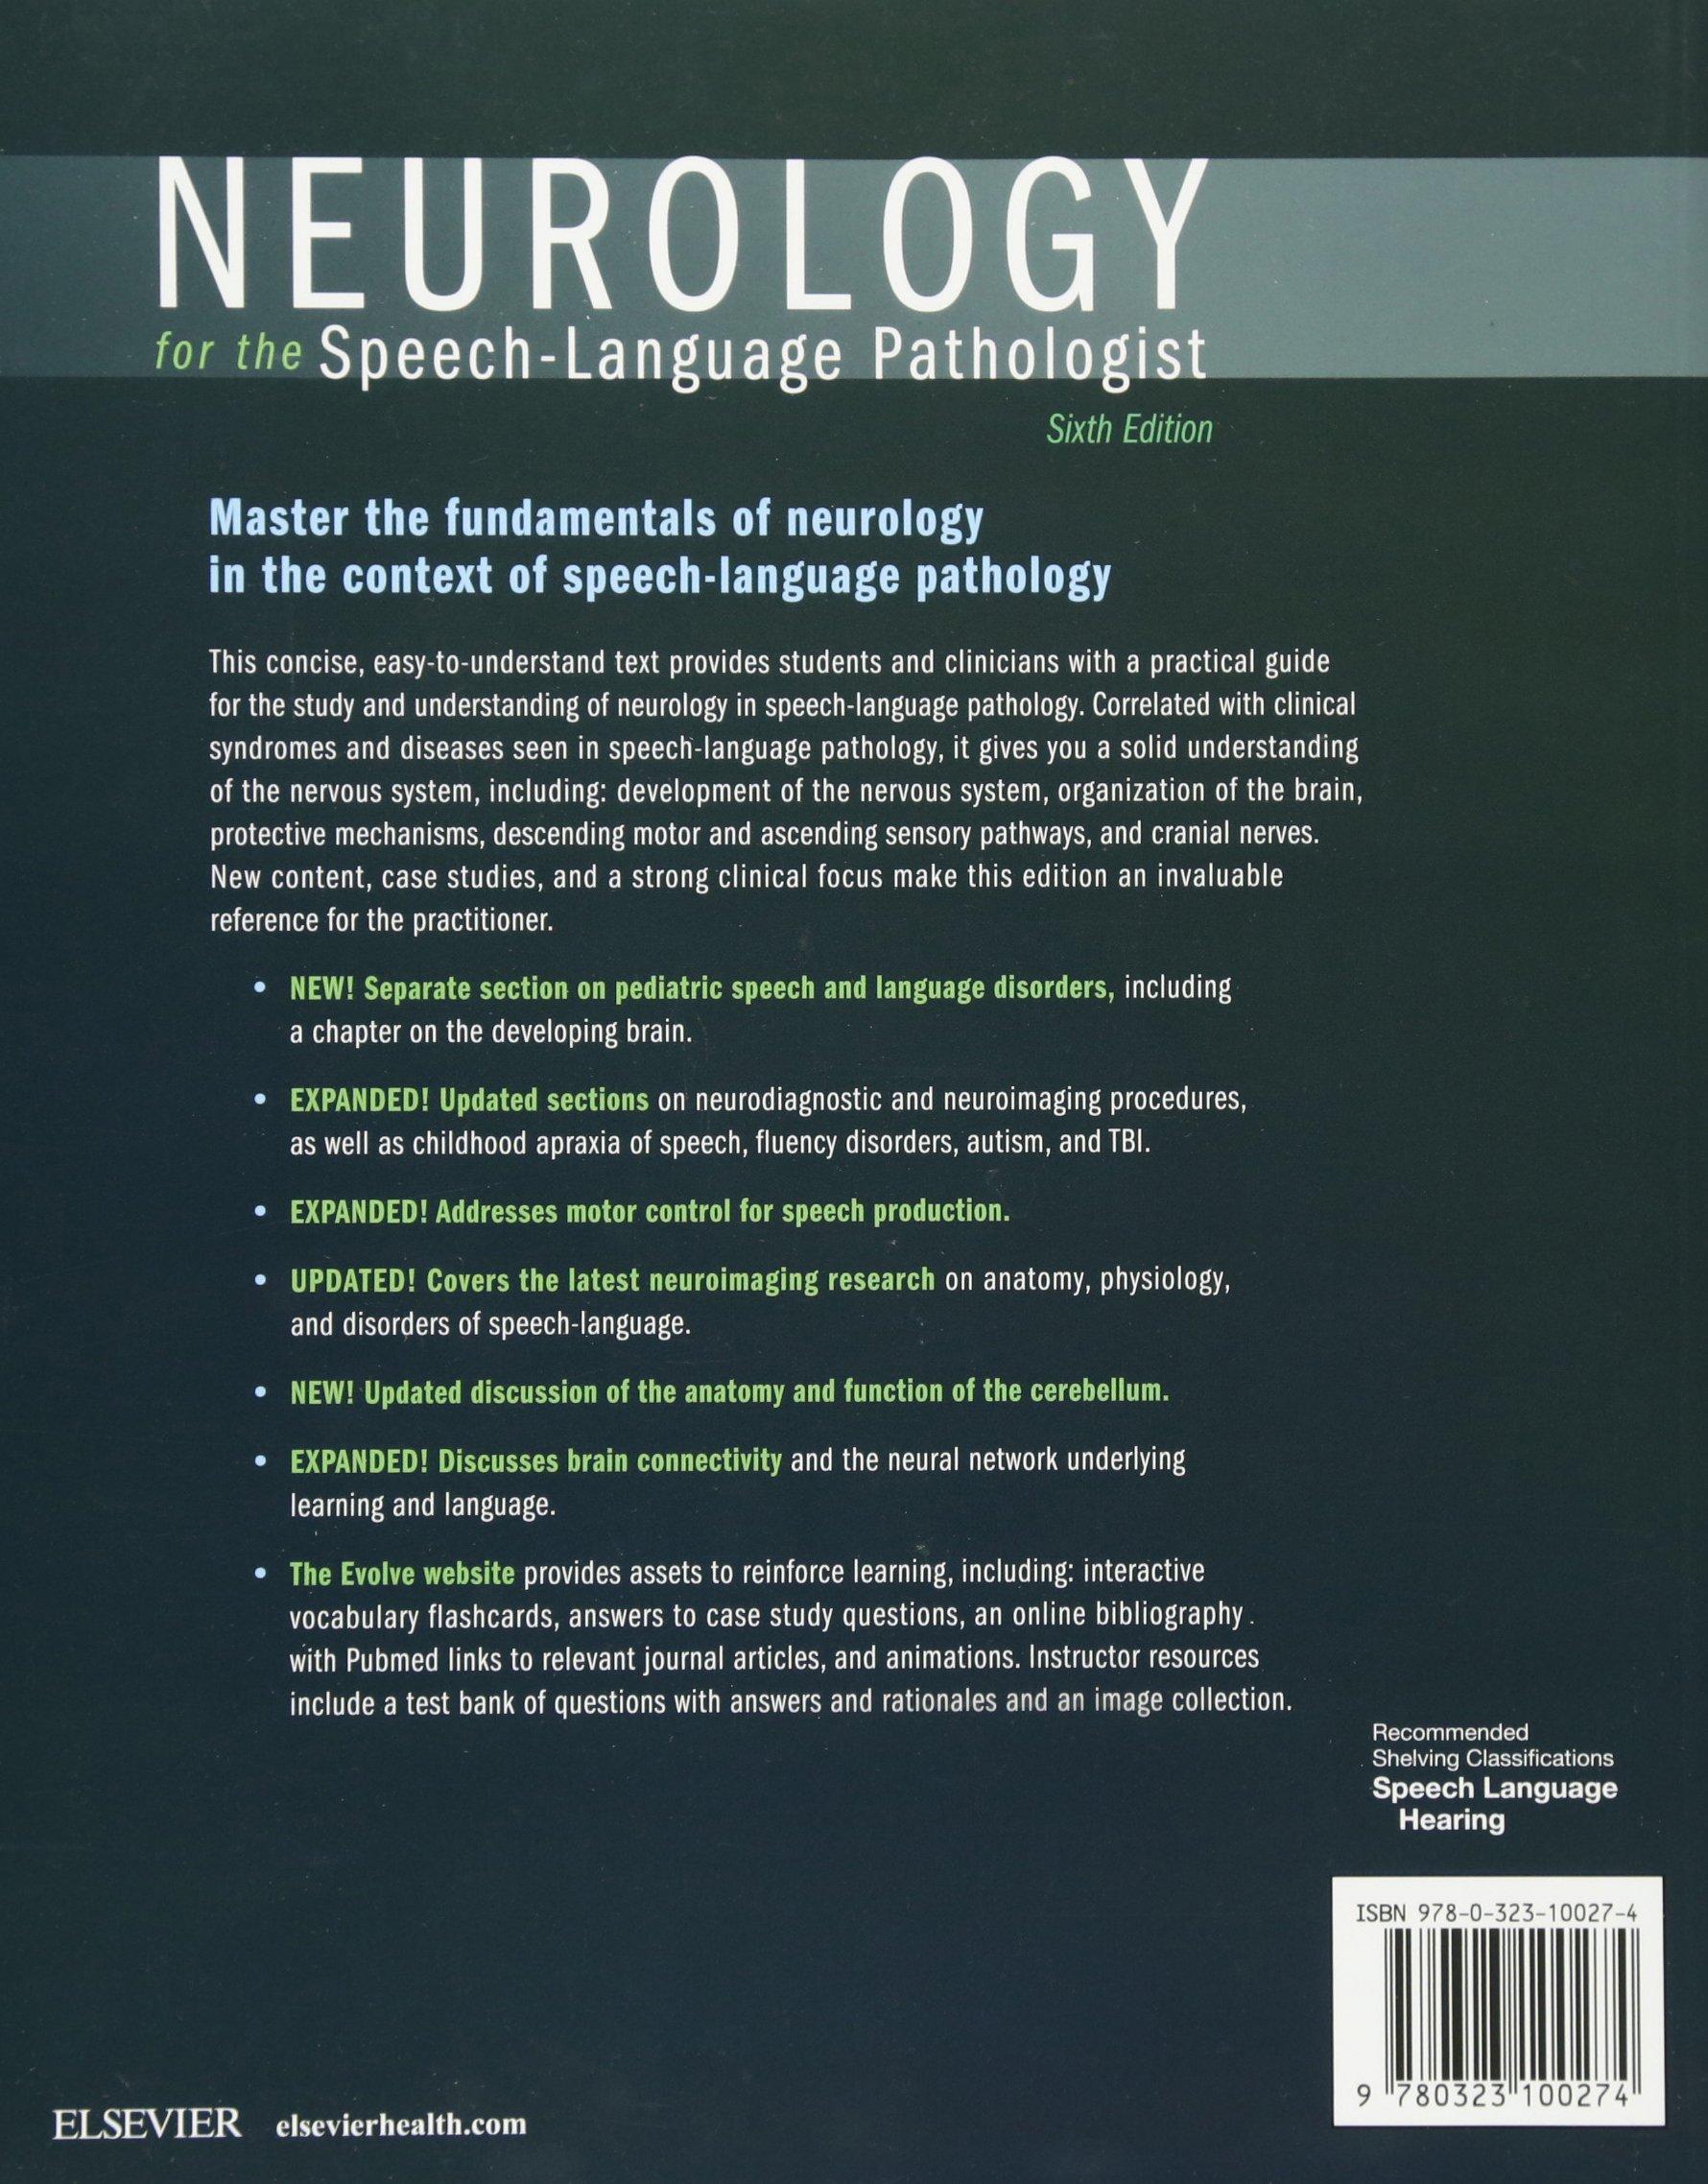 Neurology for the Speech-Language Pathologist, 6e: Amazon.co.uk ...